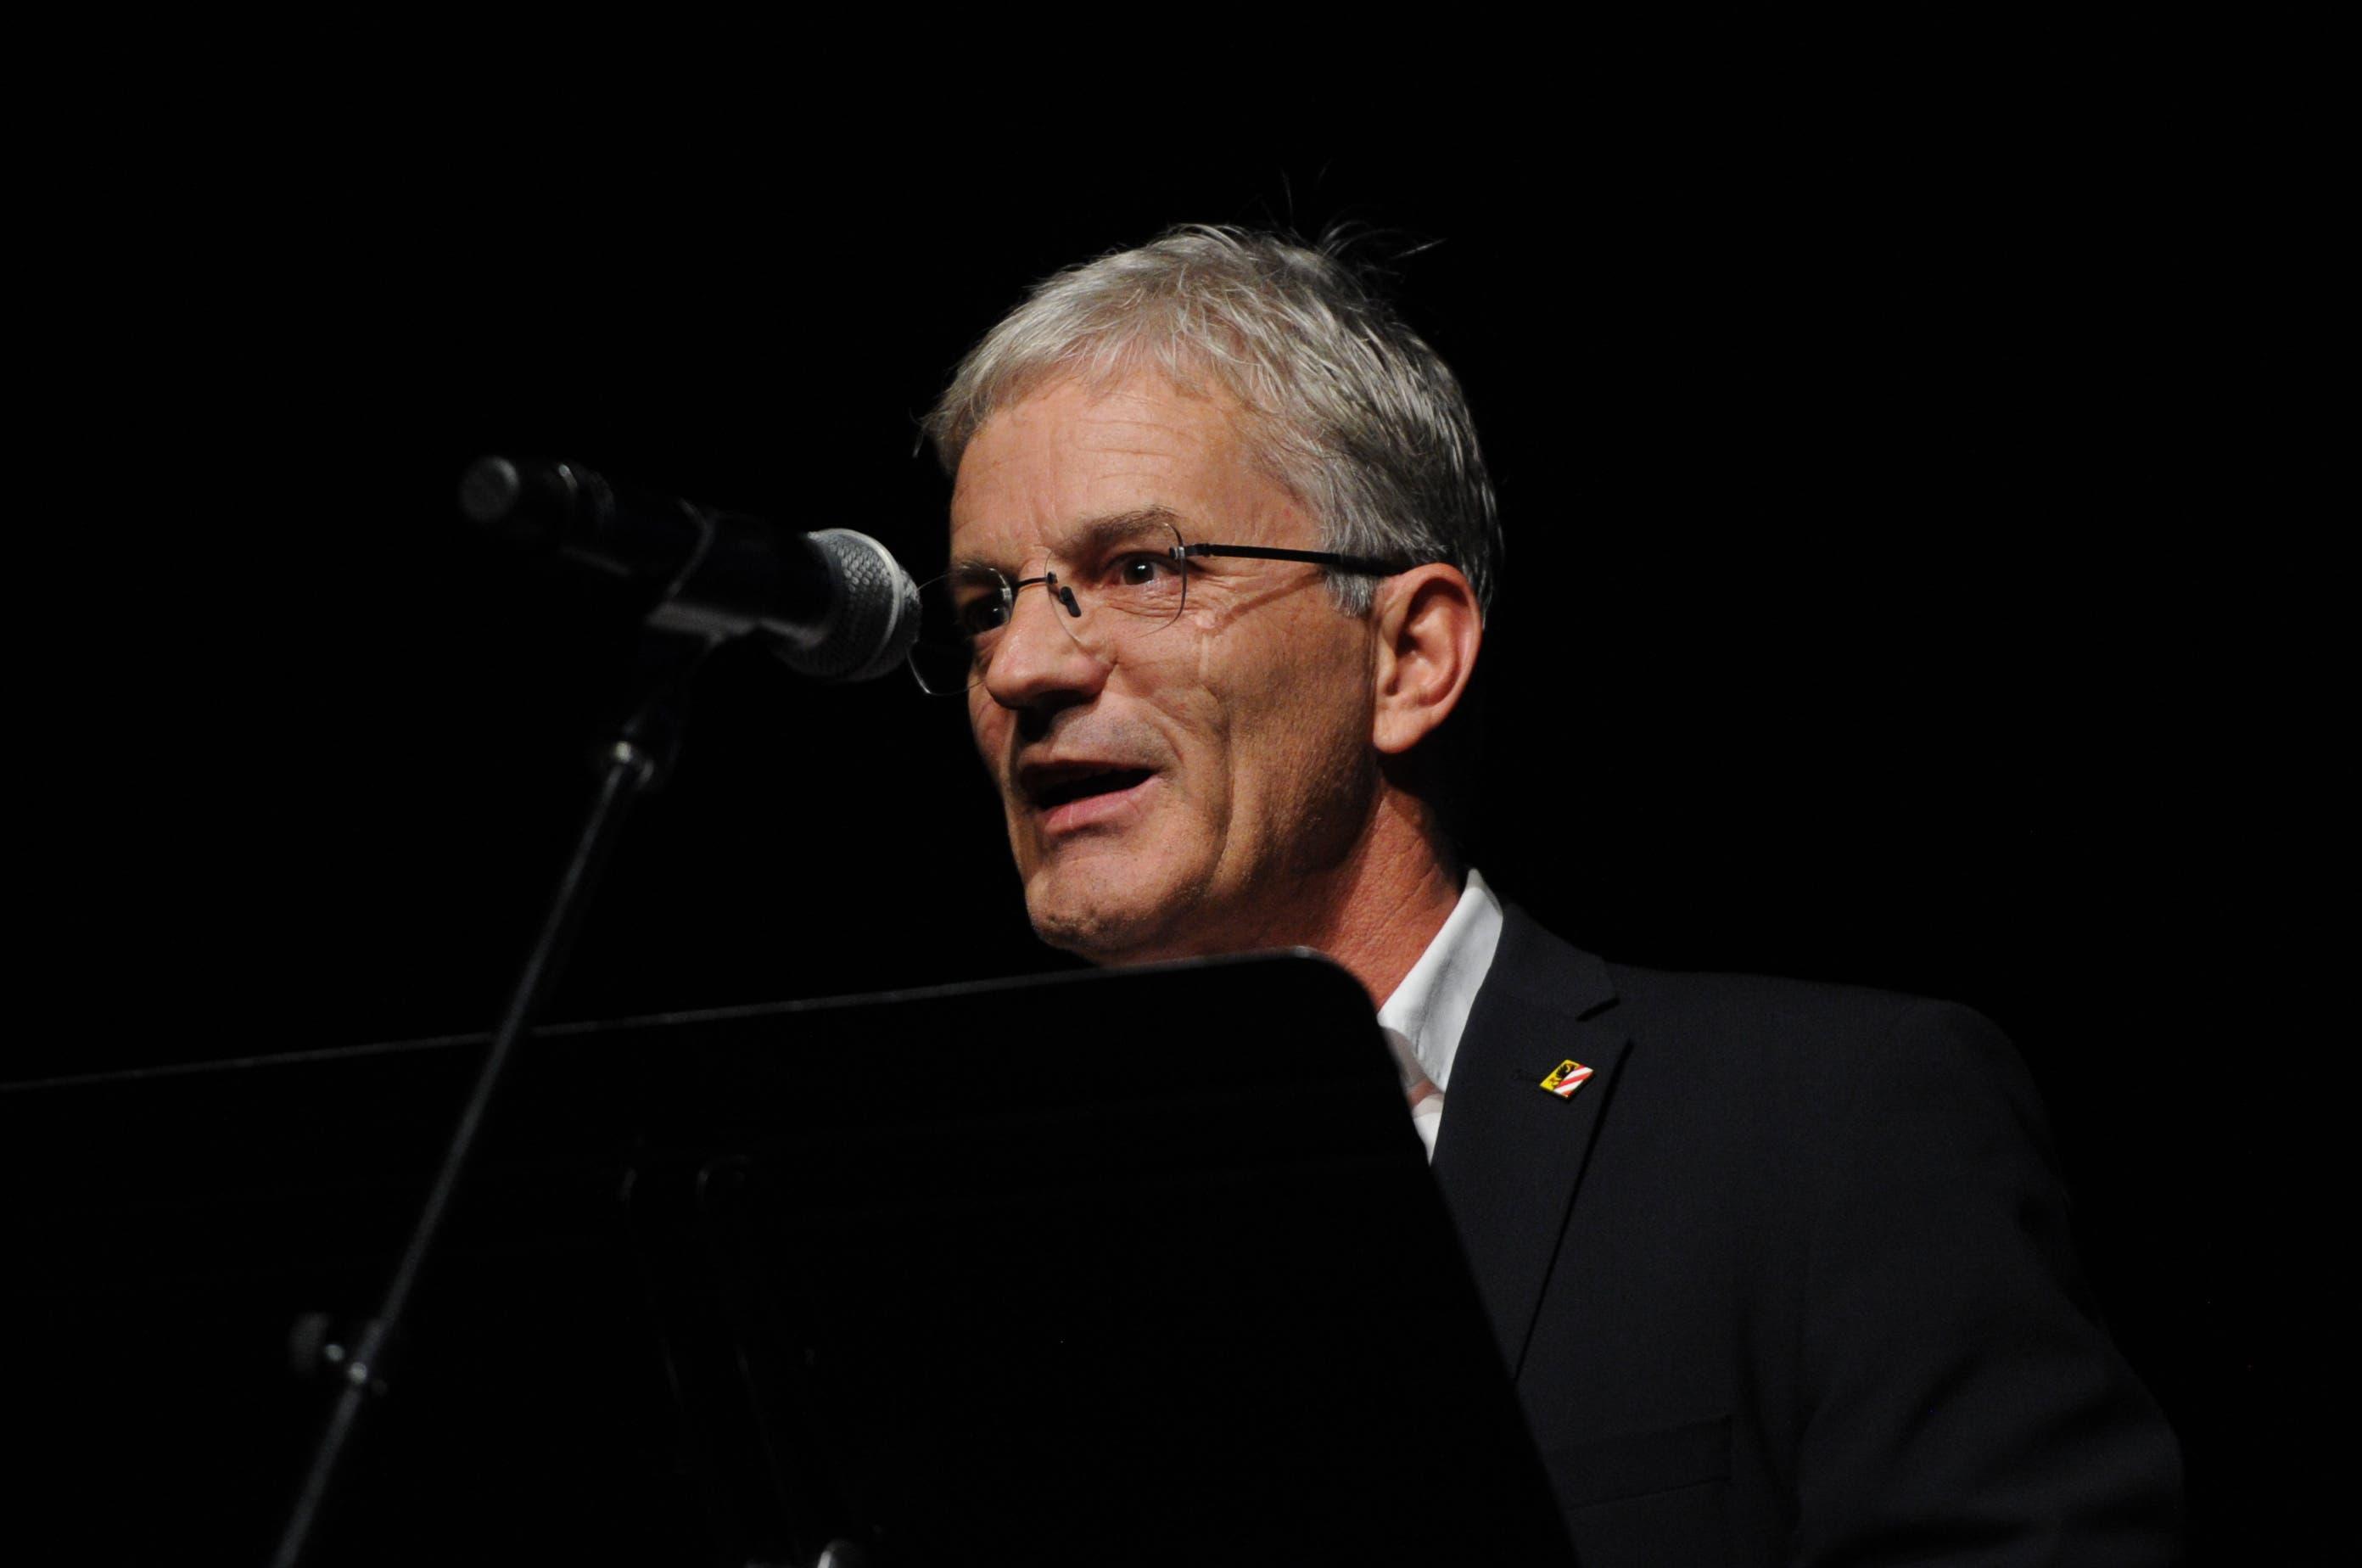 Urs Kälin, Gemeindepräsident Altdorf, begrüsste zum Festival. (Bild: Urs Hanhart)